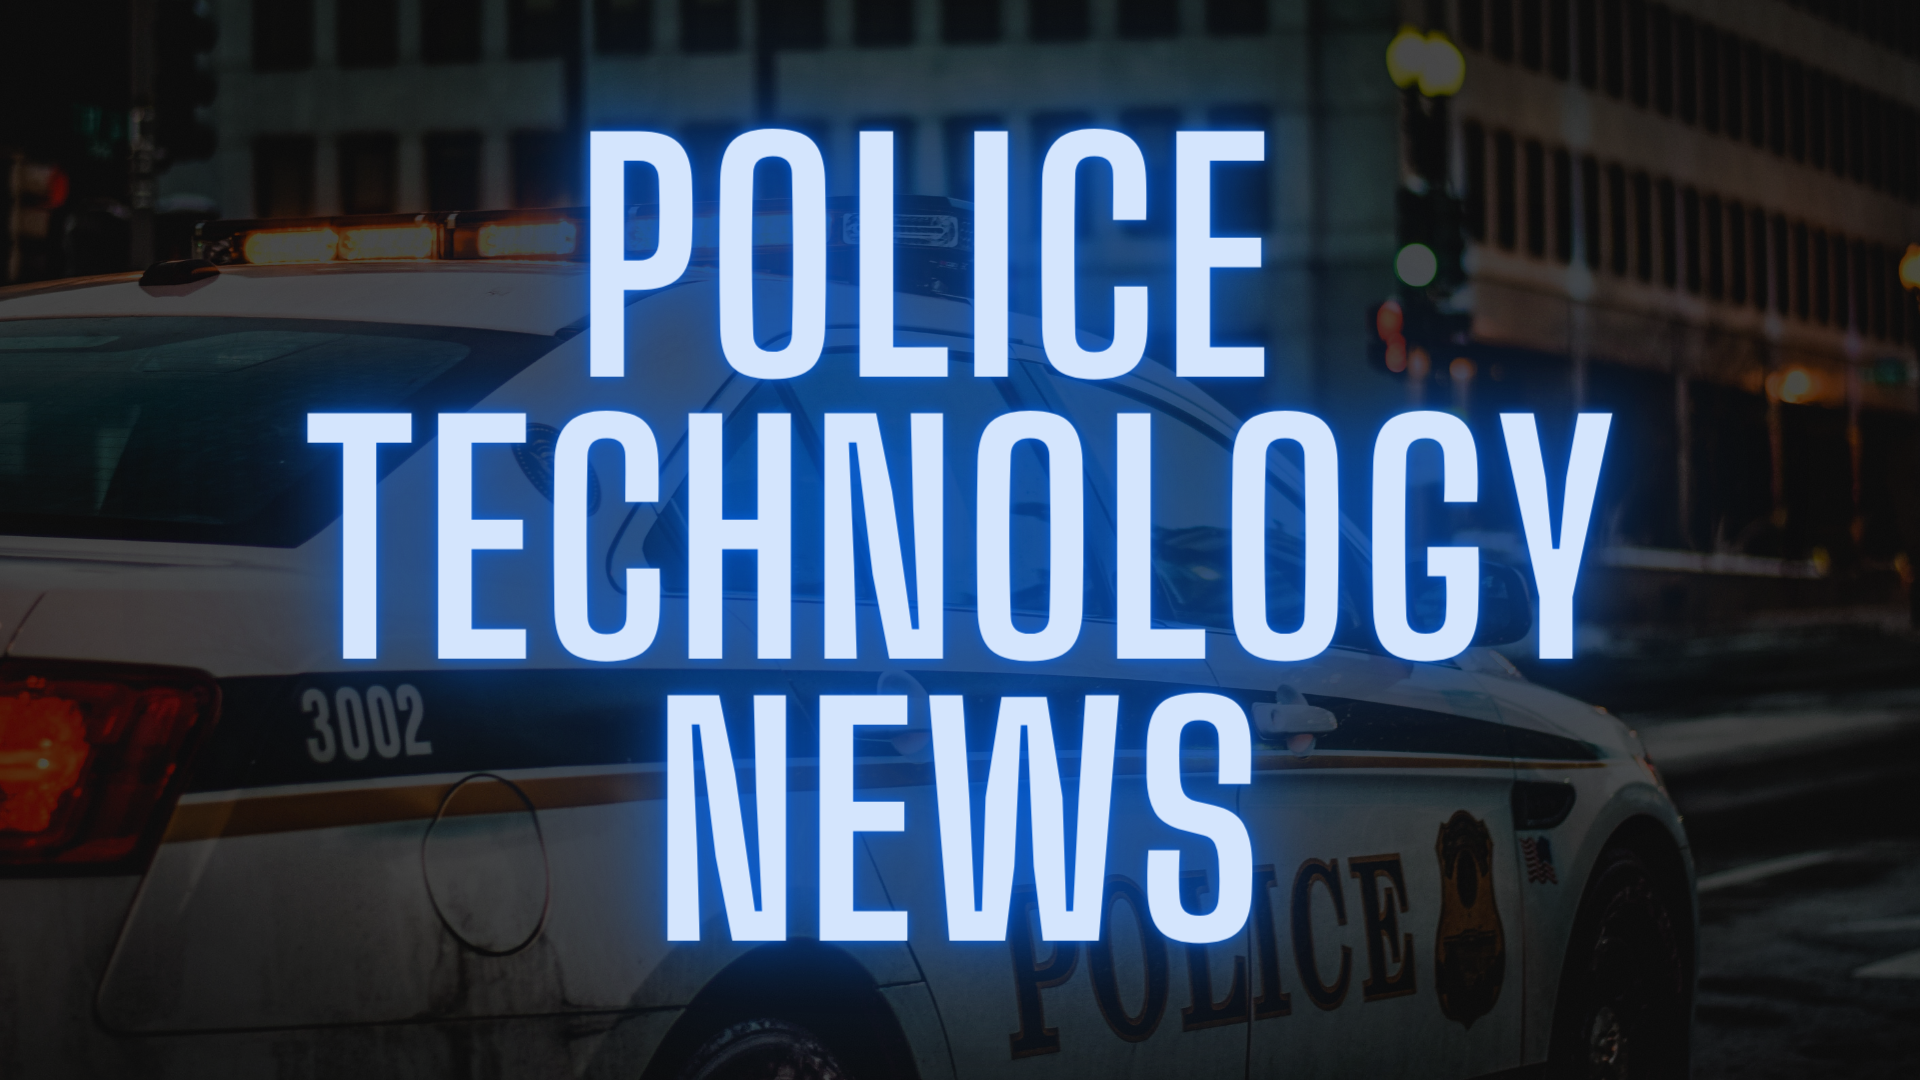 Police Technology News